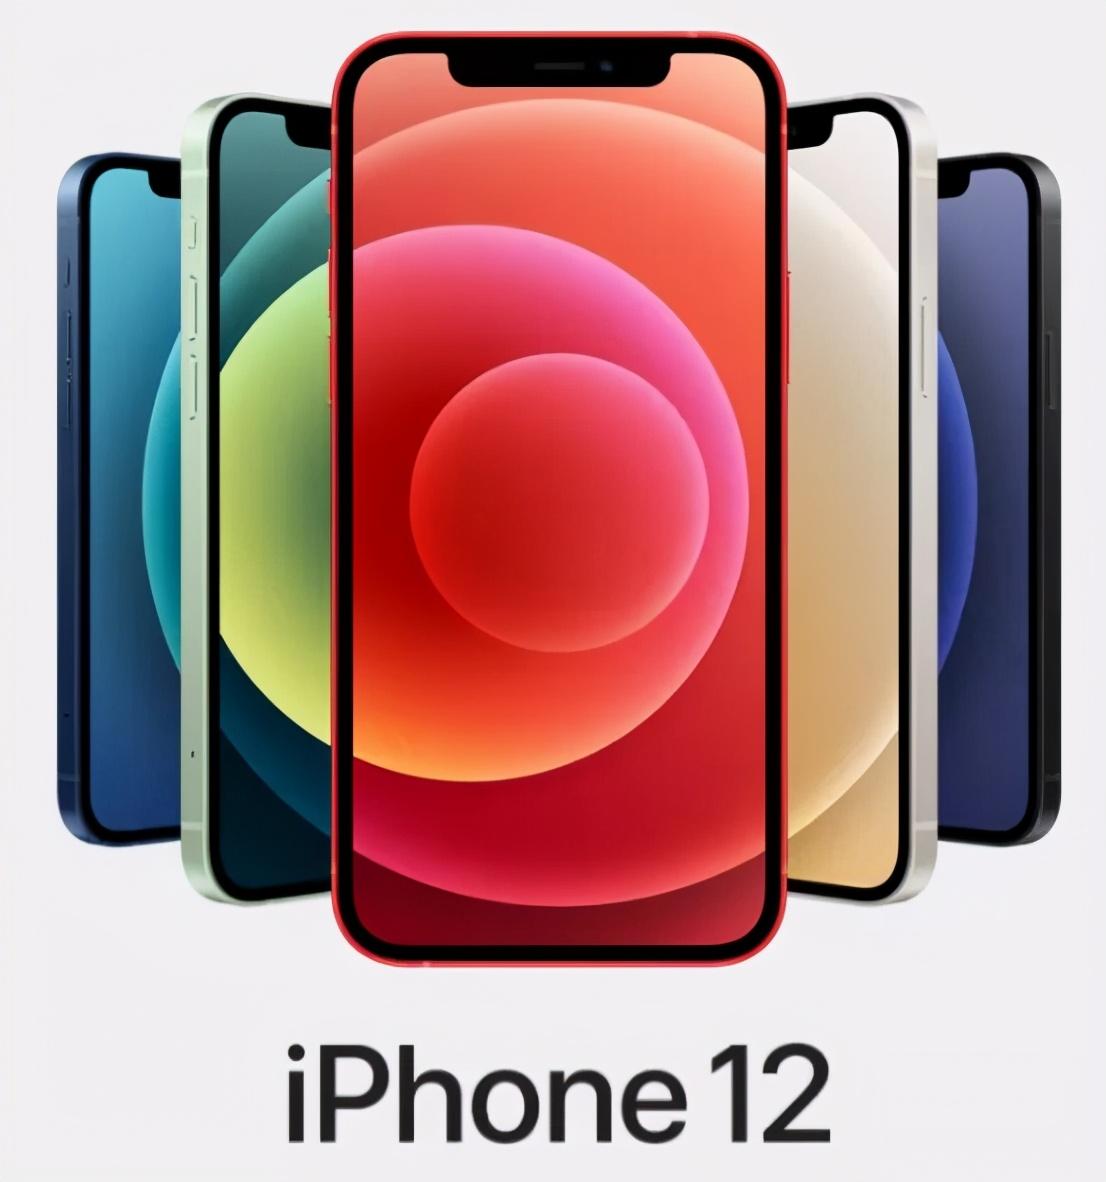 iPhone 12还有这些没有公布的秘密